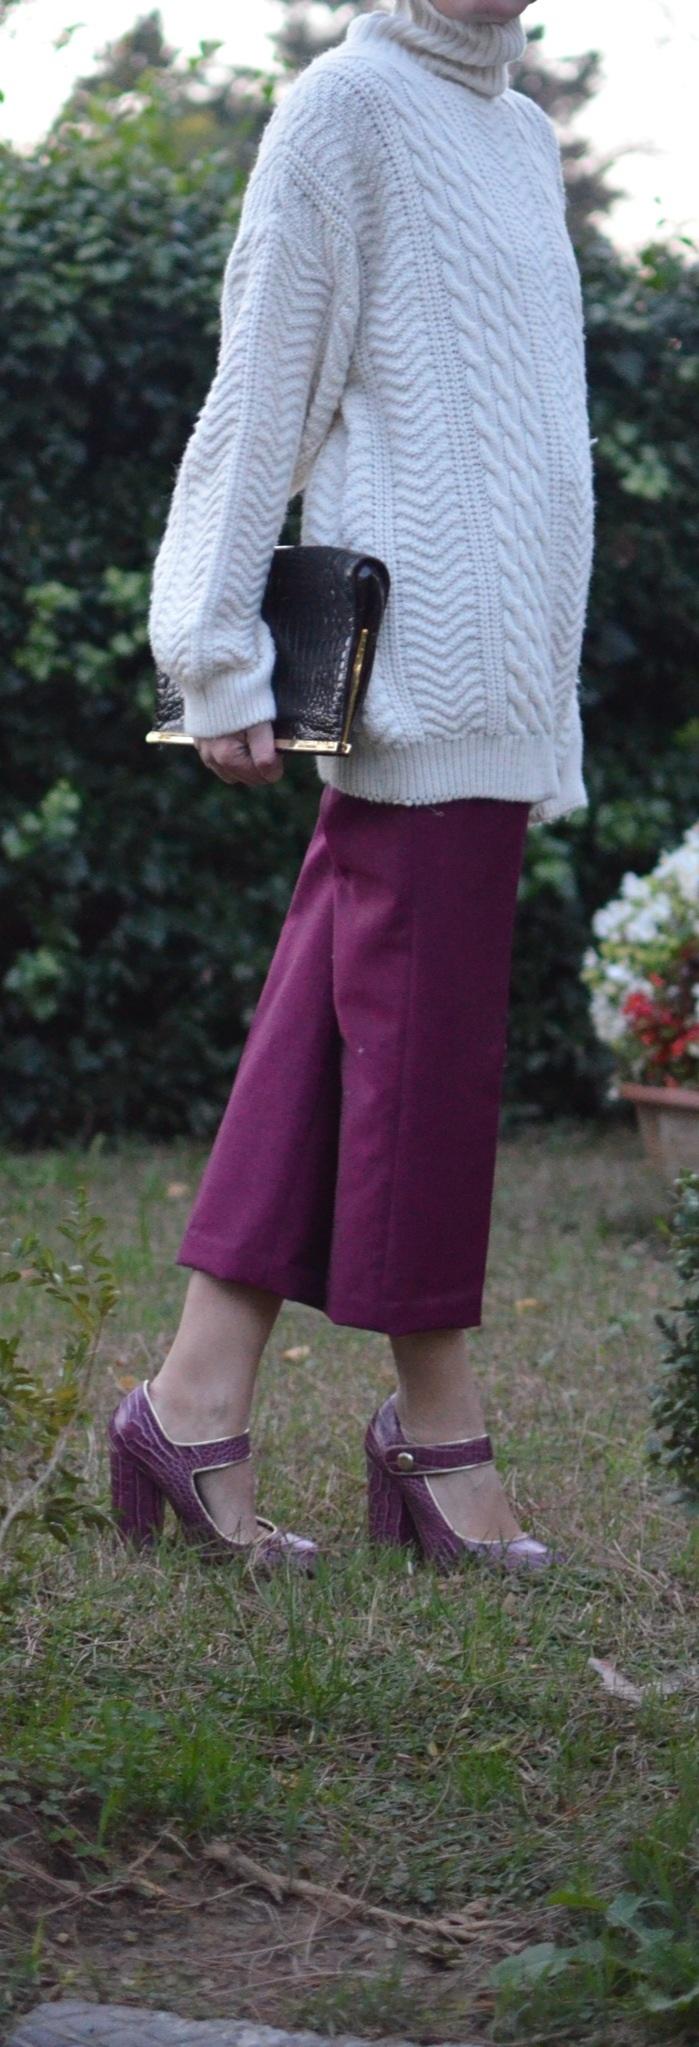 Vintage sweater, sweater mania, maglione bianco, maglione e collo al to bianco, maglione oversize, pantaloni oversize, pantaloni Prada, pantaloni fucsia, pantaloni alla caviglia, oversize outfit, mysouldress, Anastasia style, italian fashion blogger, vintage blog, vintage blogger,